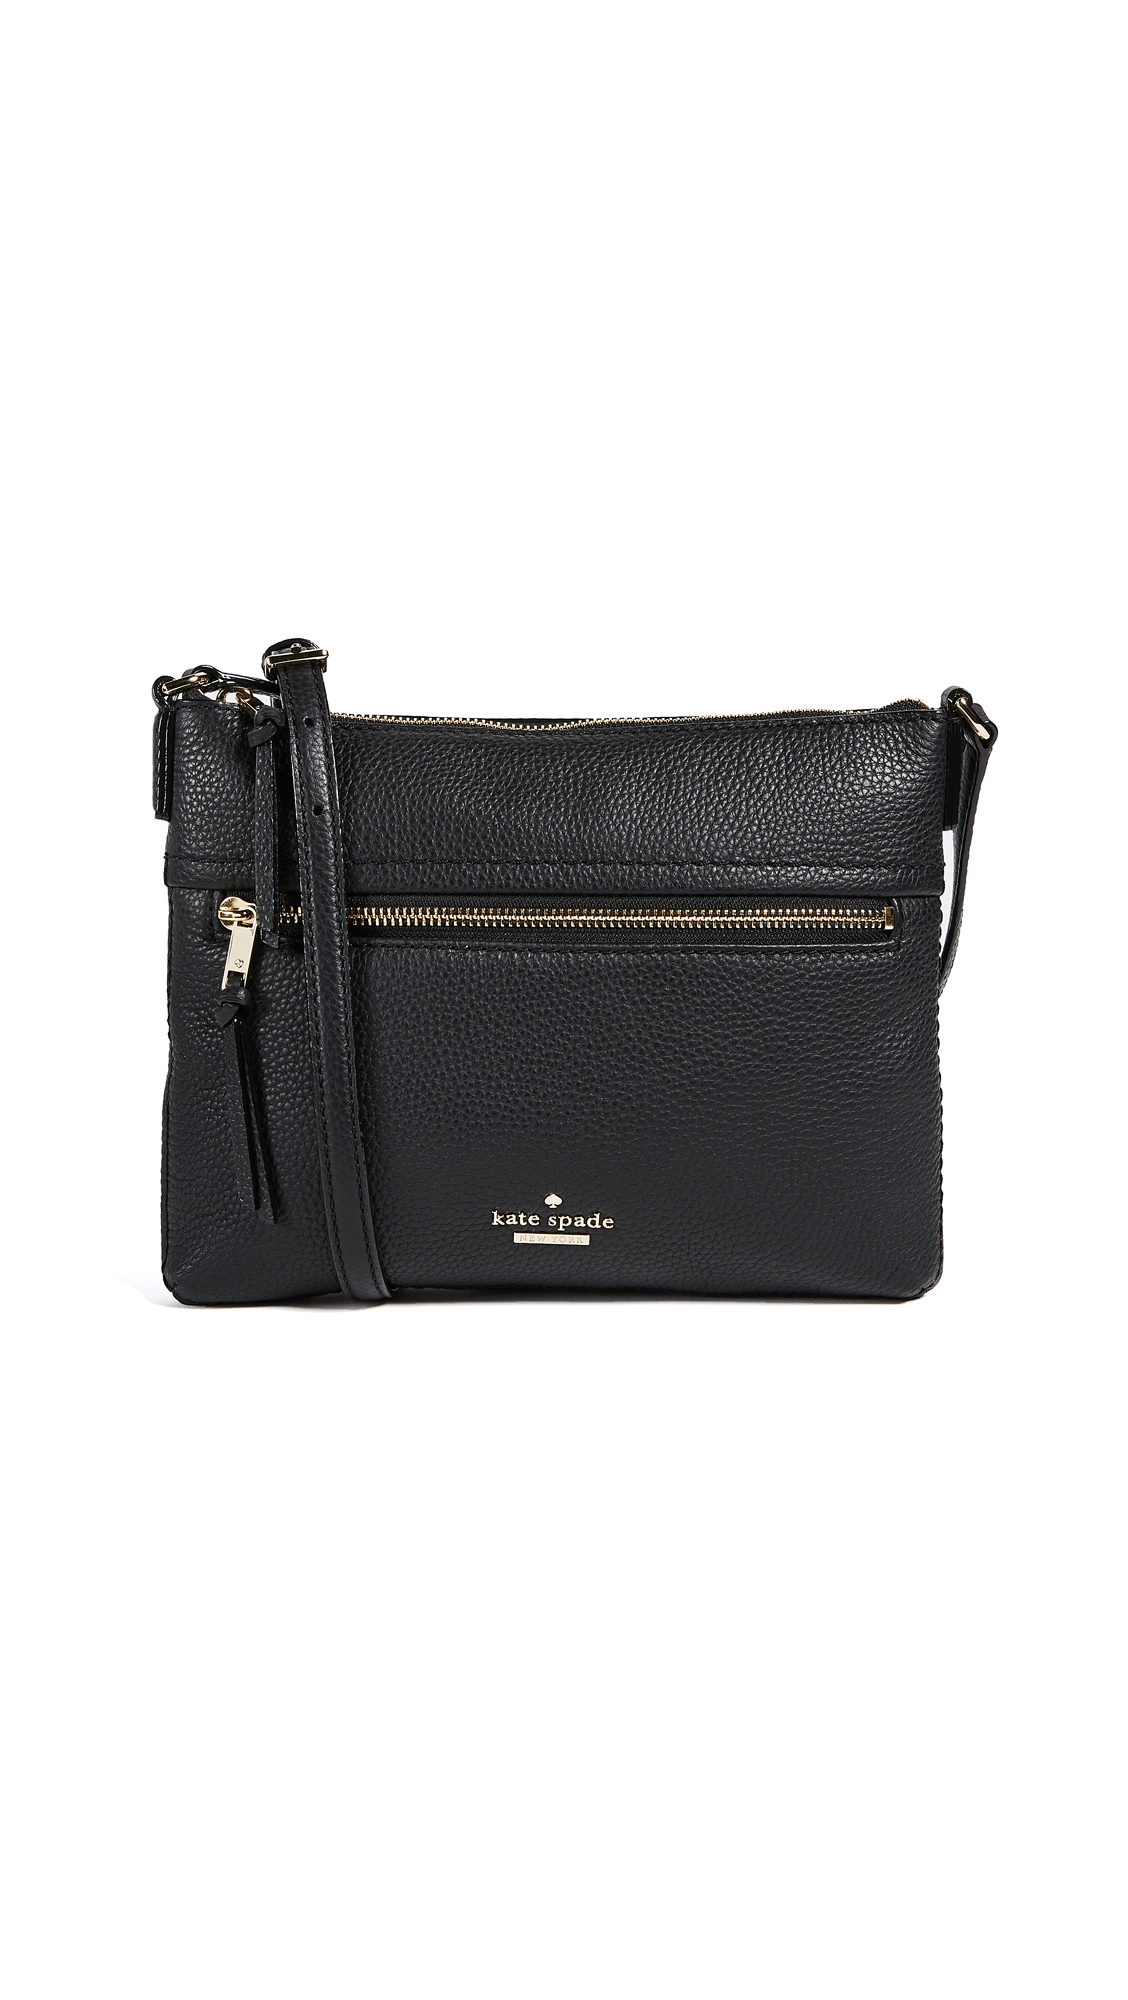 Kate Spade New York Jackson Street Gabriele Bag - Black